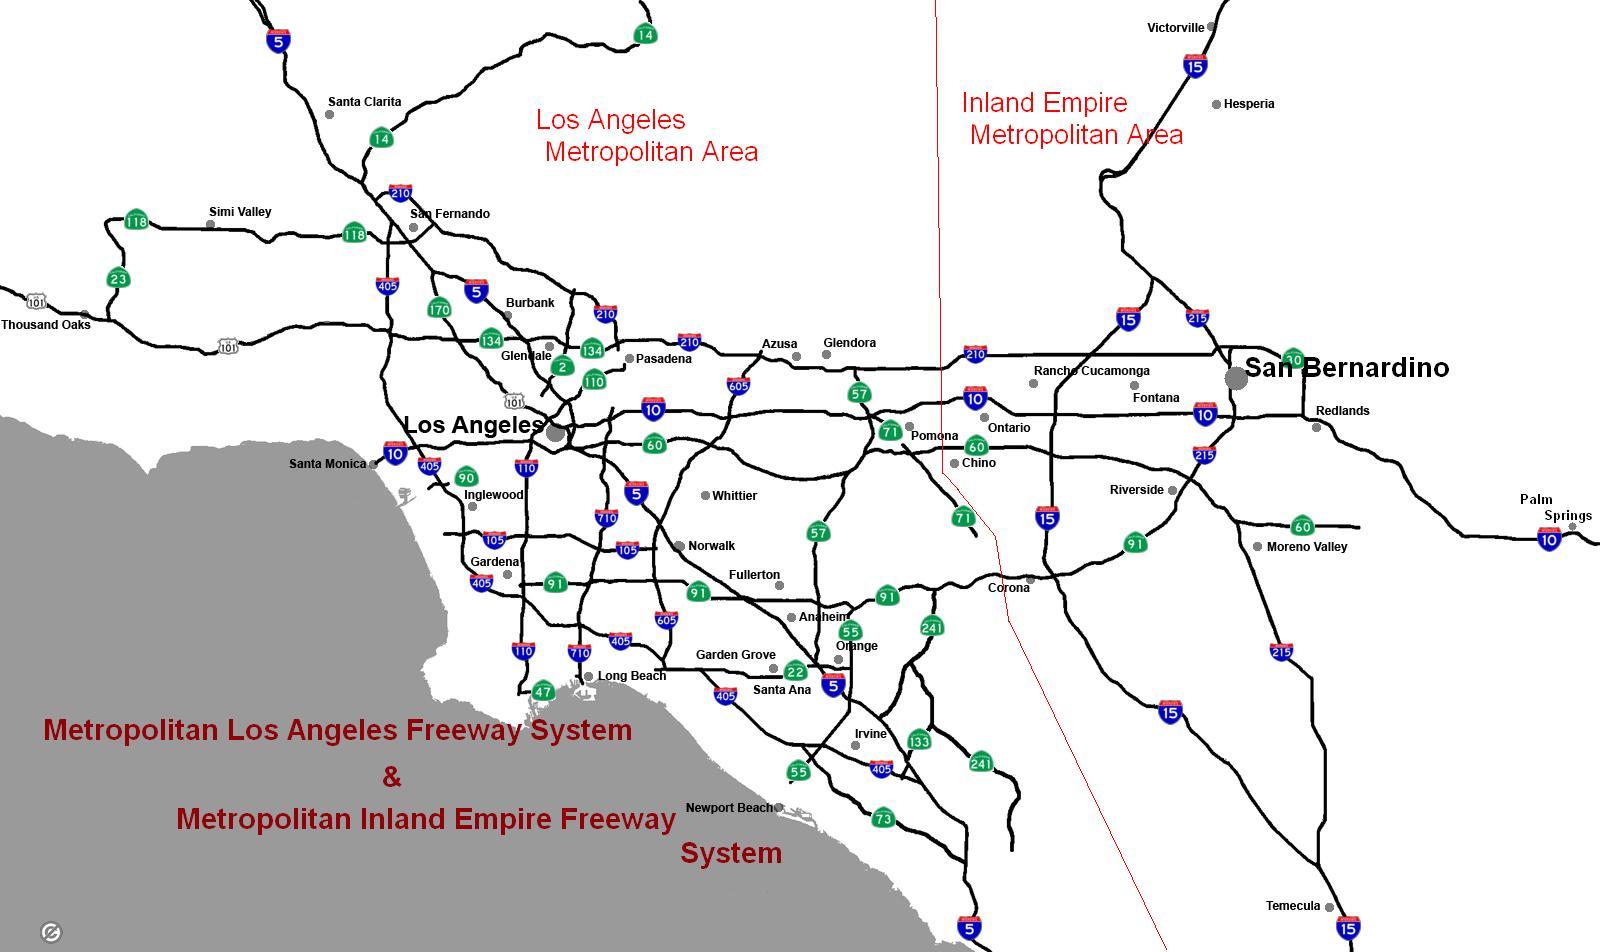 Filela ie freeway systemg wikimedia commons filela ie freeway systemg publicscrutiny Images